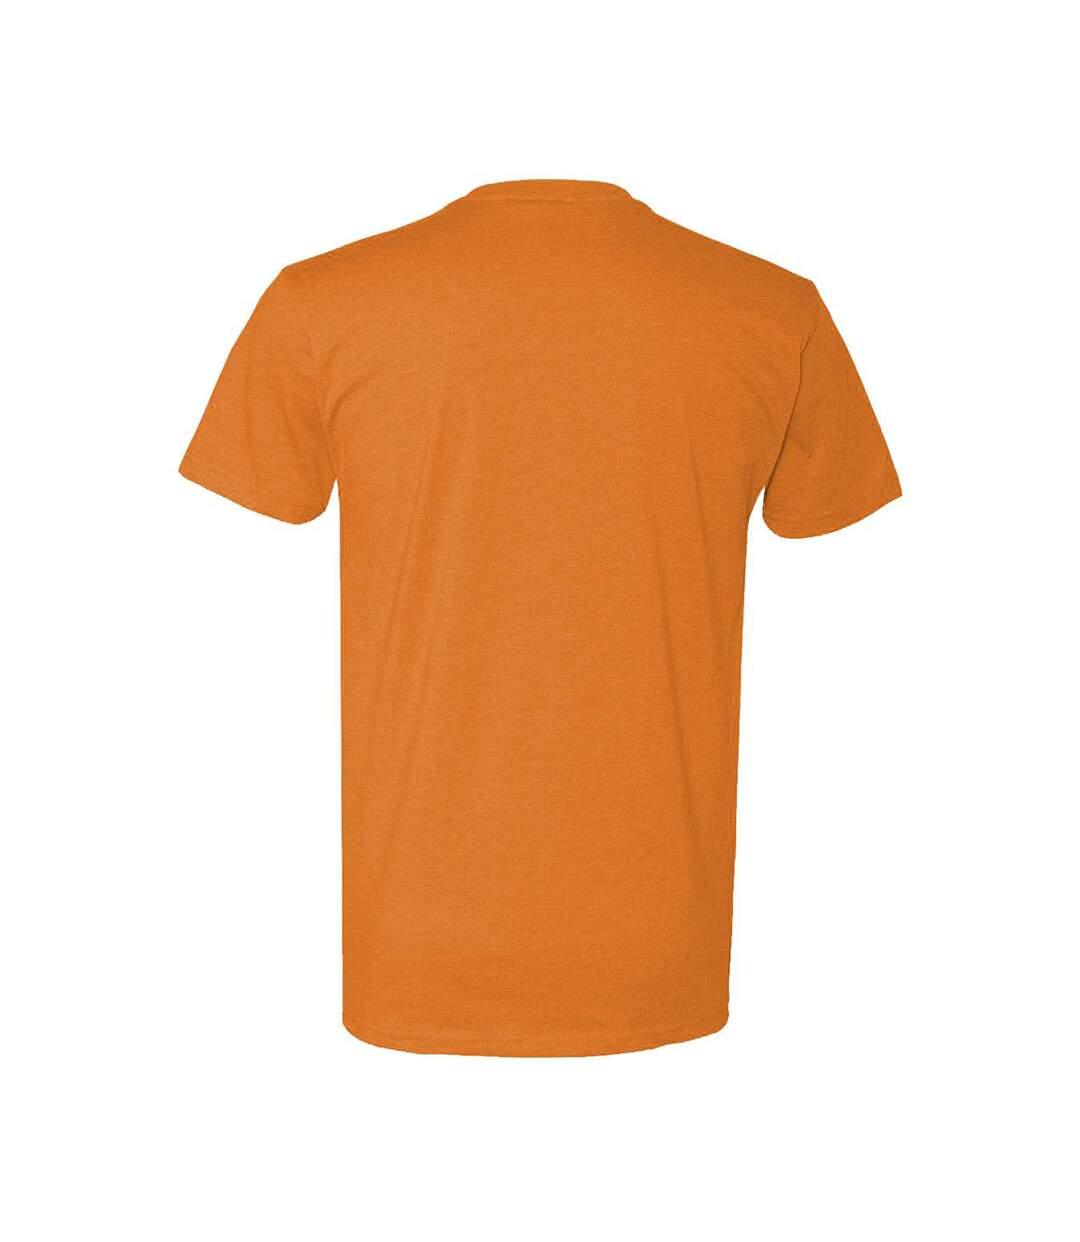 Next Level Adults Unisex CVC Crew Neck T-Shirt (Silk) - UTPC3480